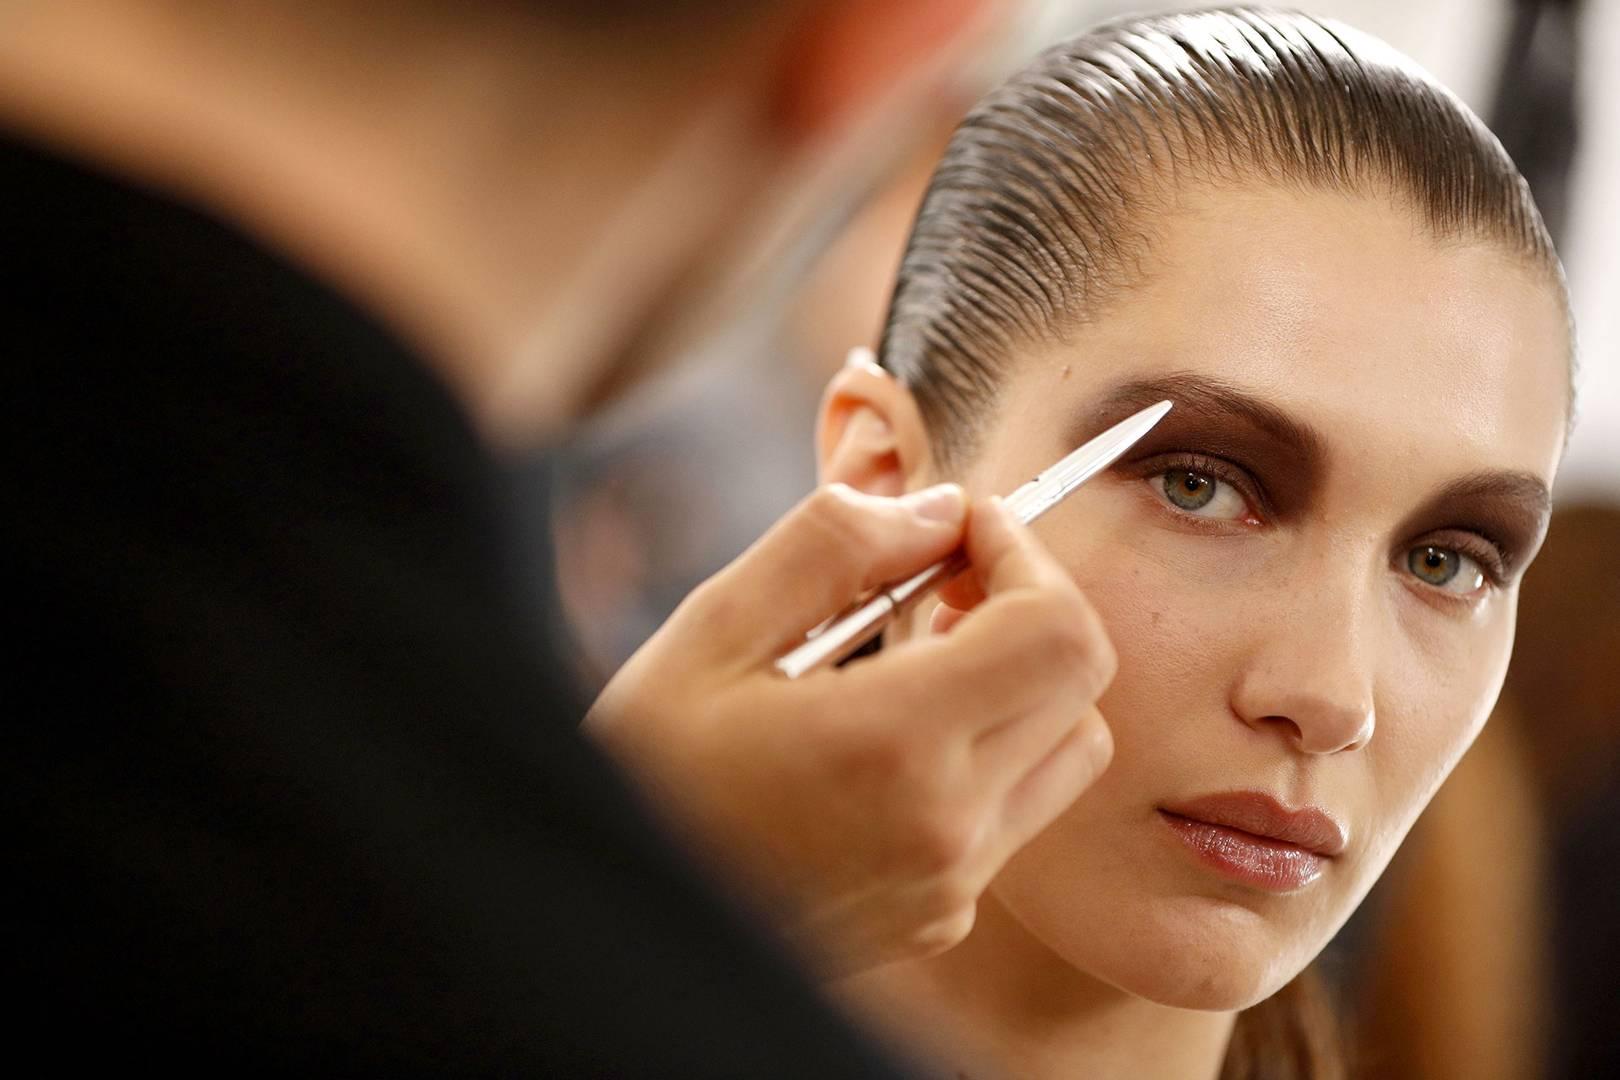 c9a98f29879 How To Become A Celebrity Make-Up Artist | British Vogue